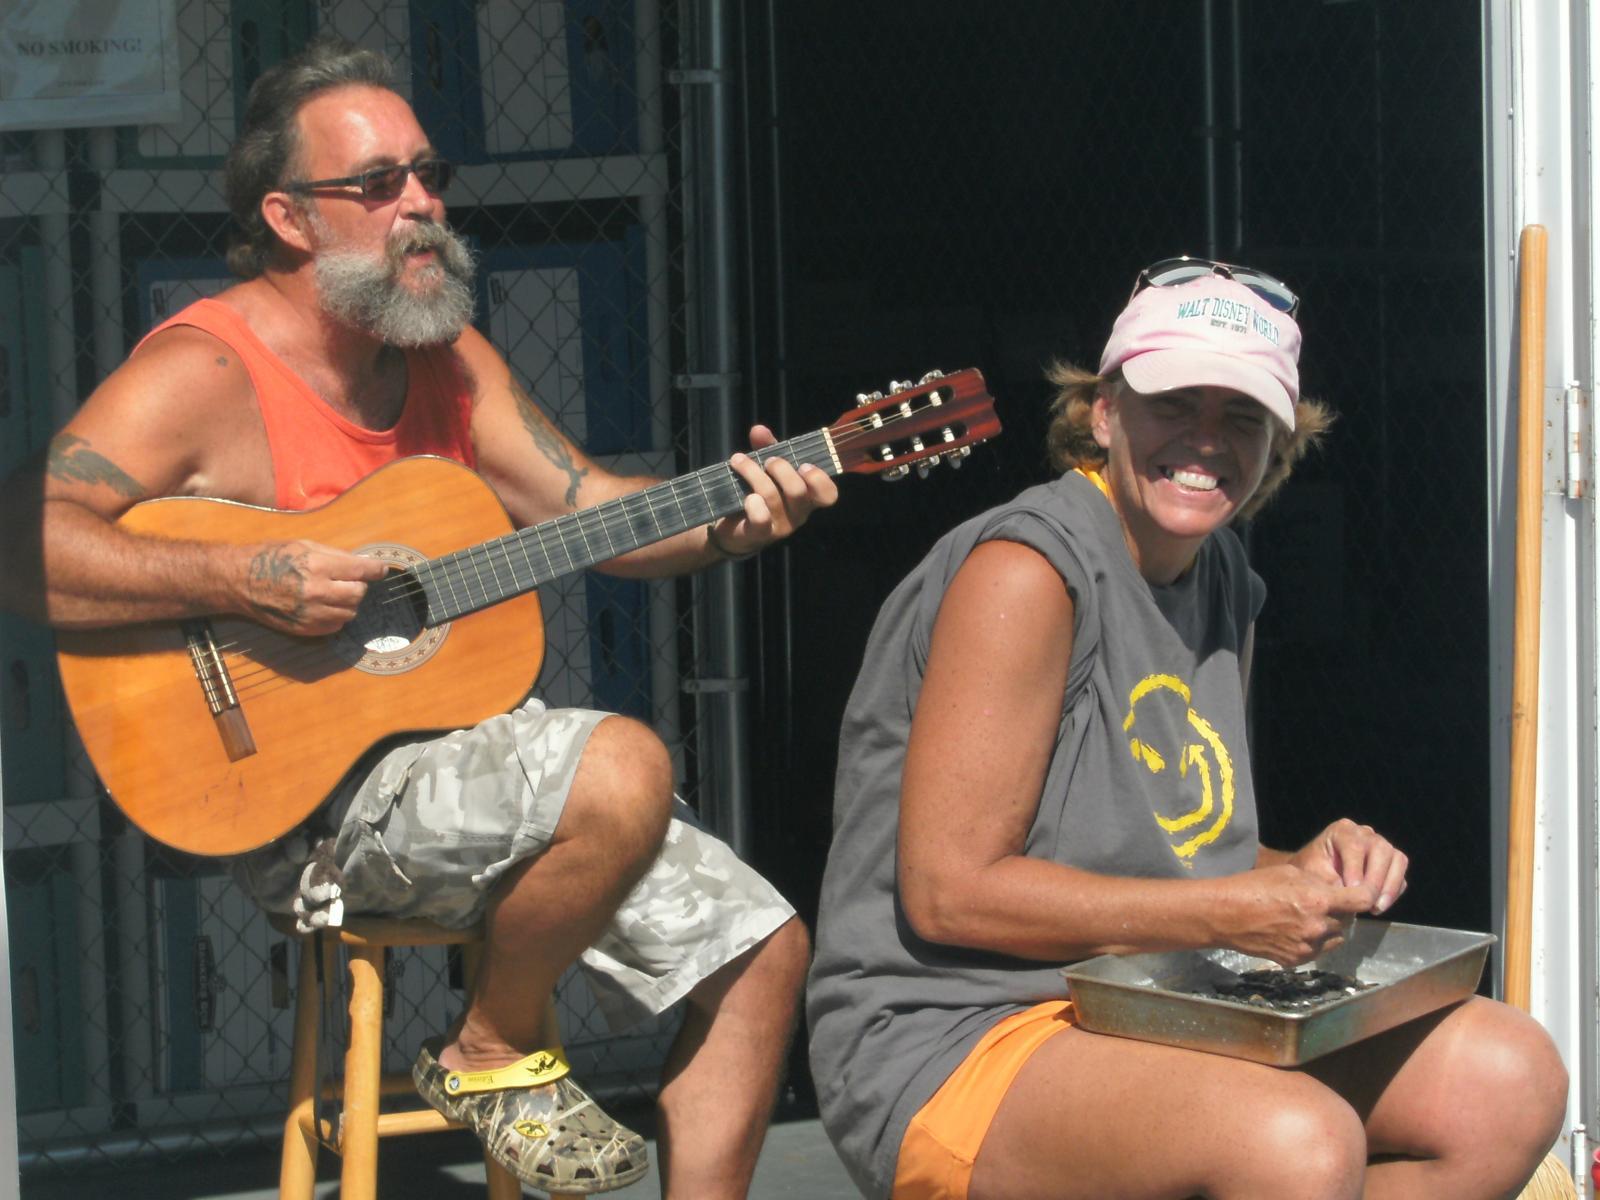 entertainment at event Sarasota, FL